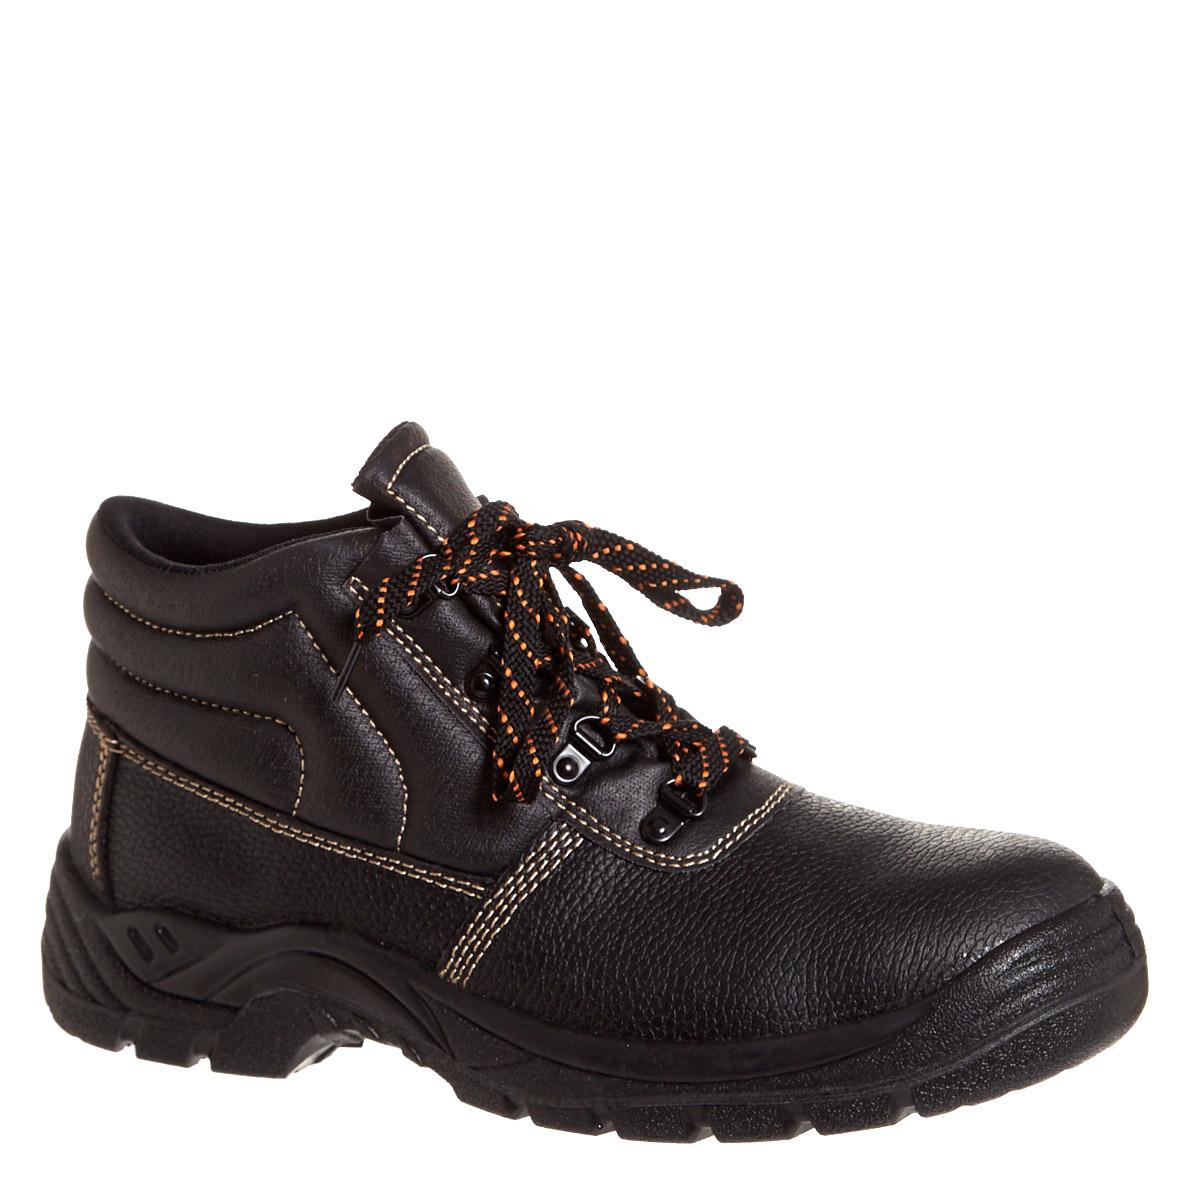 956b28972e0 Steel Toe Cap Work Boots